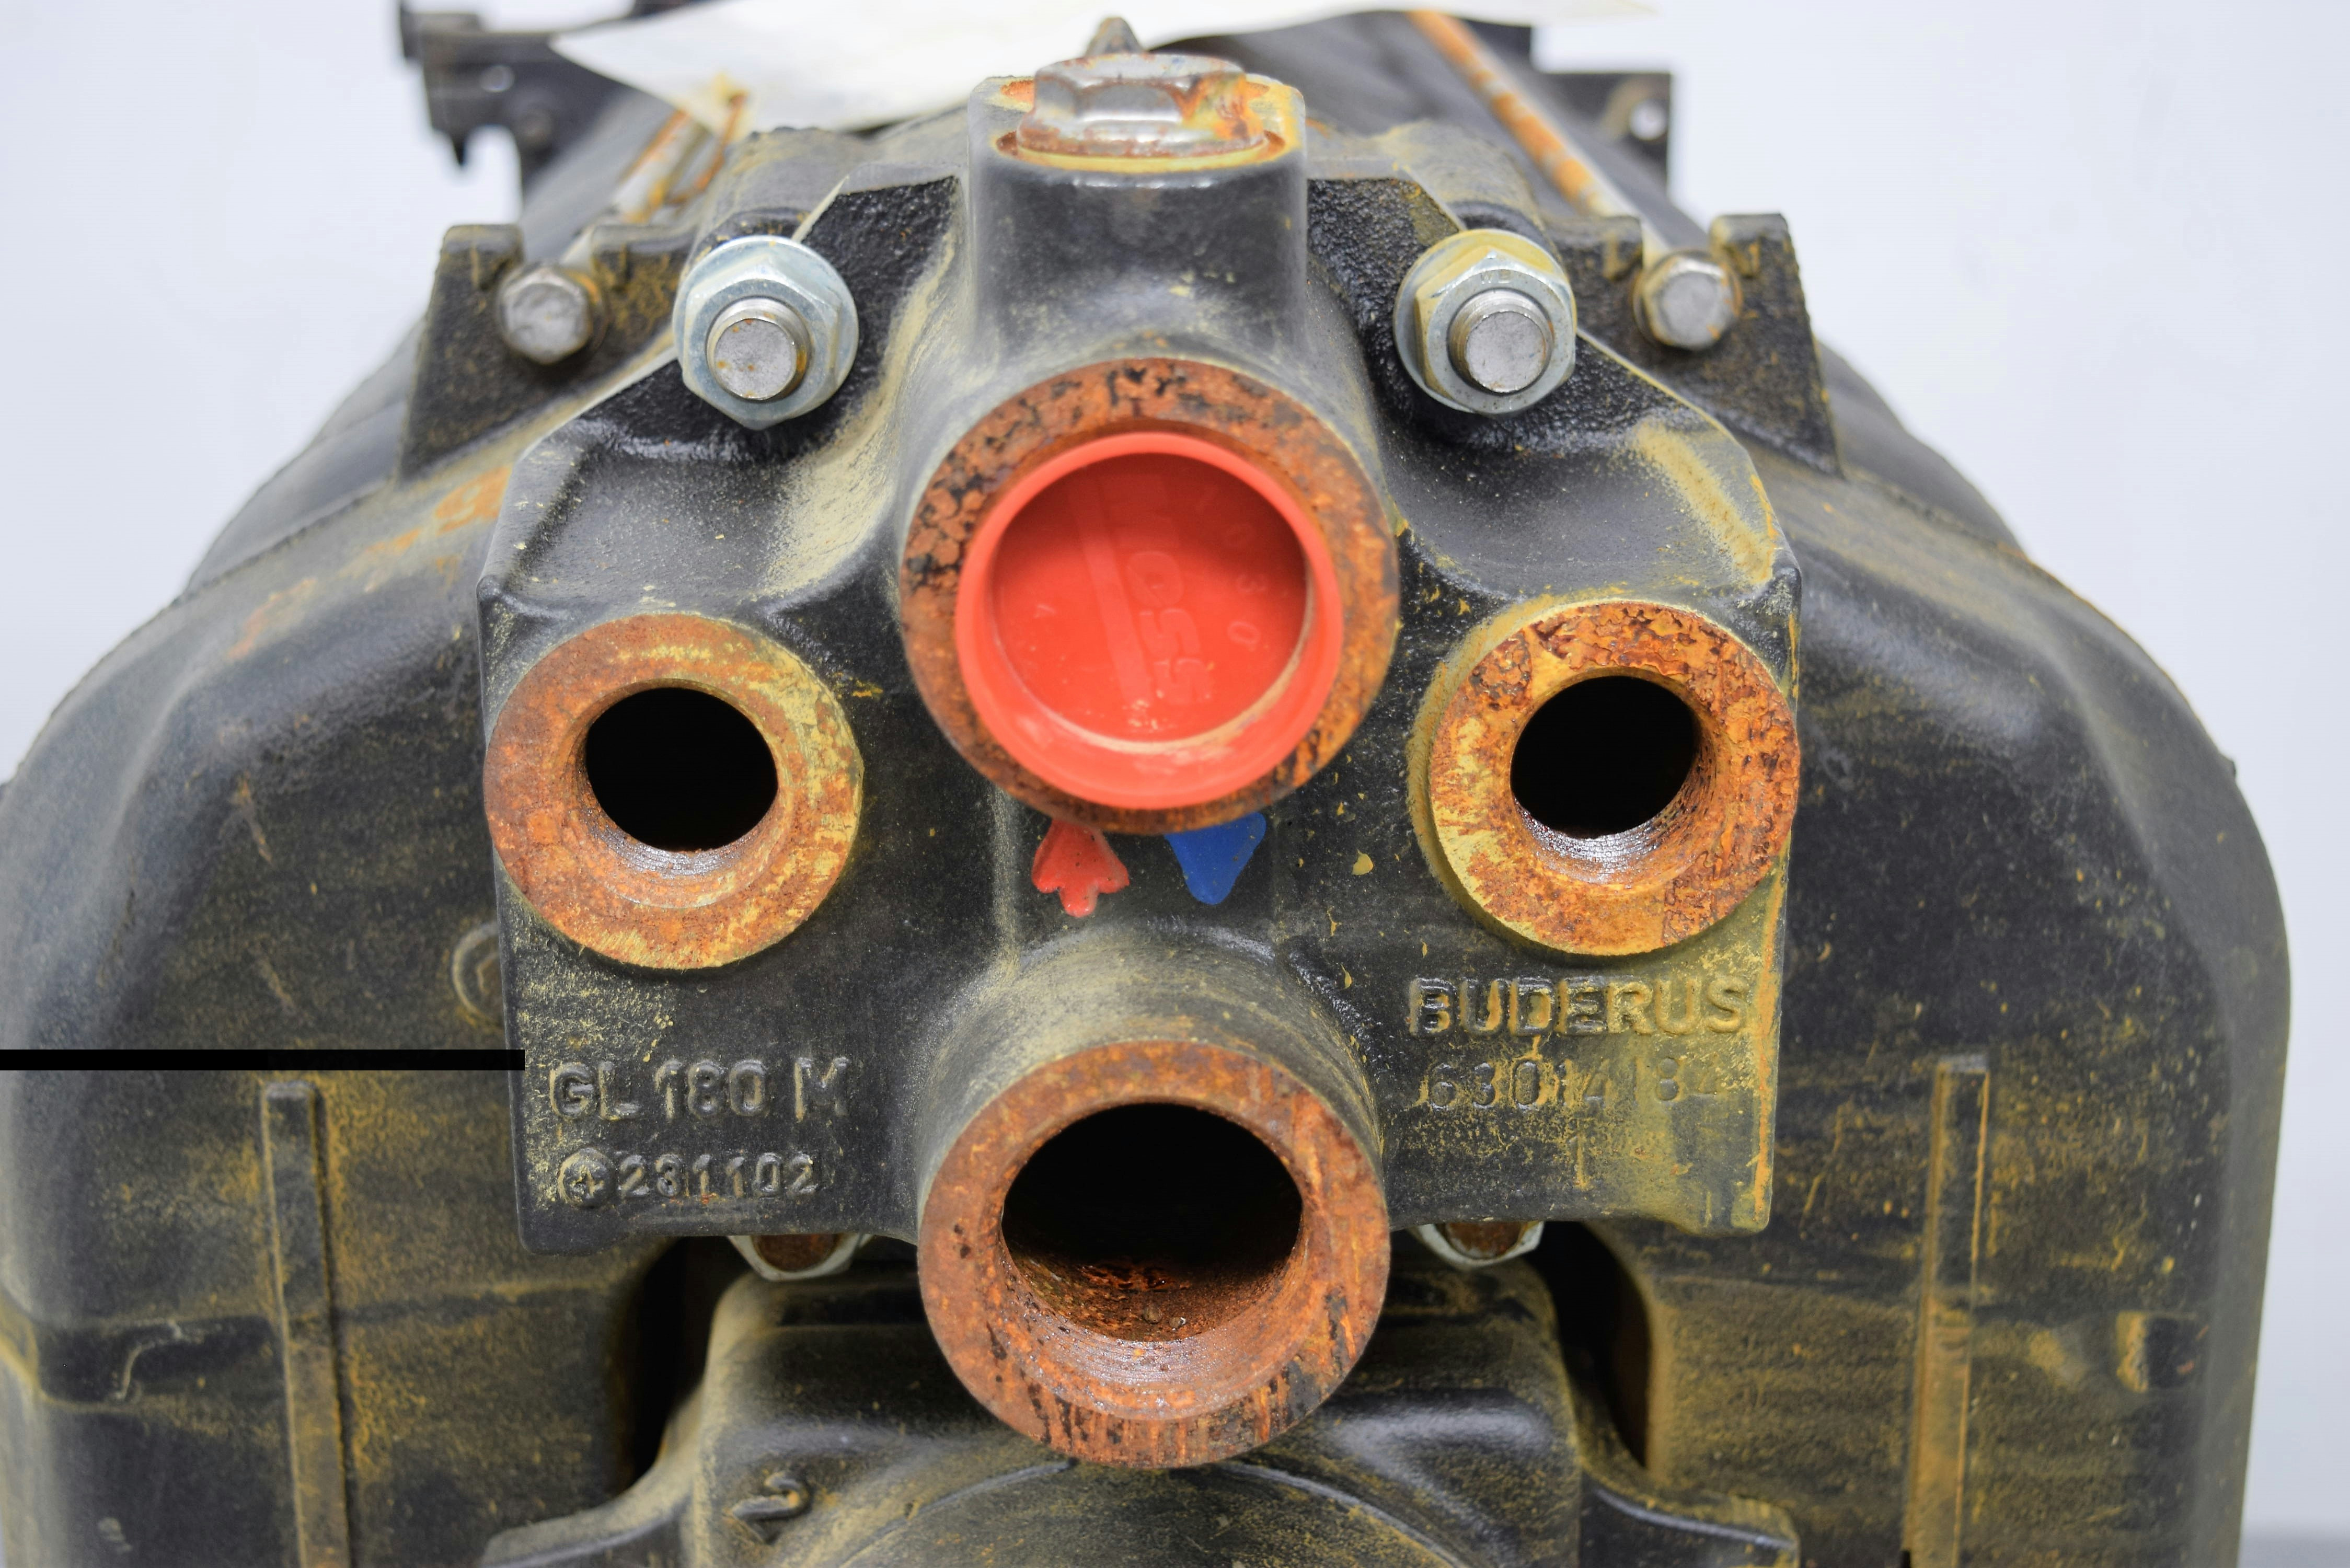 New Buderus G215 7 Waste Used Oil Gas Burner 294k Btu Hot Water Boiler Furnace Ebay